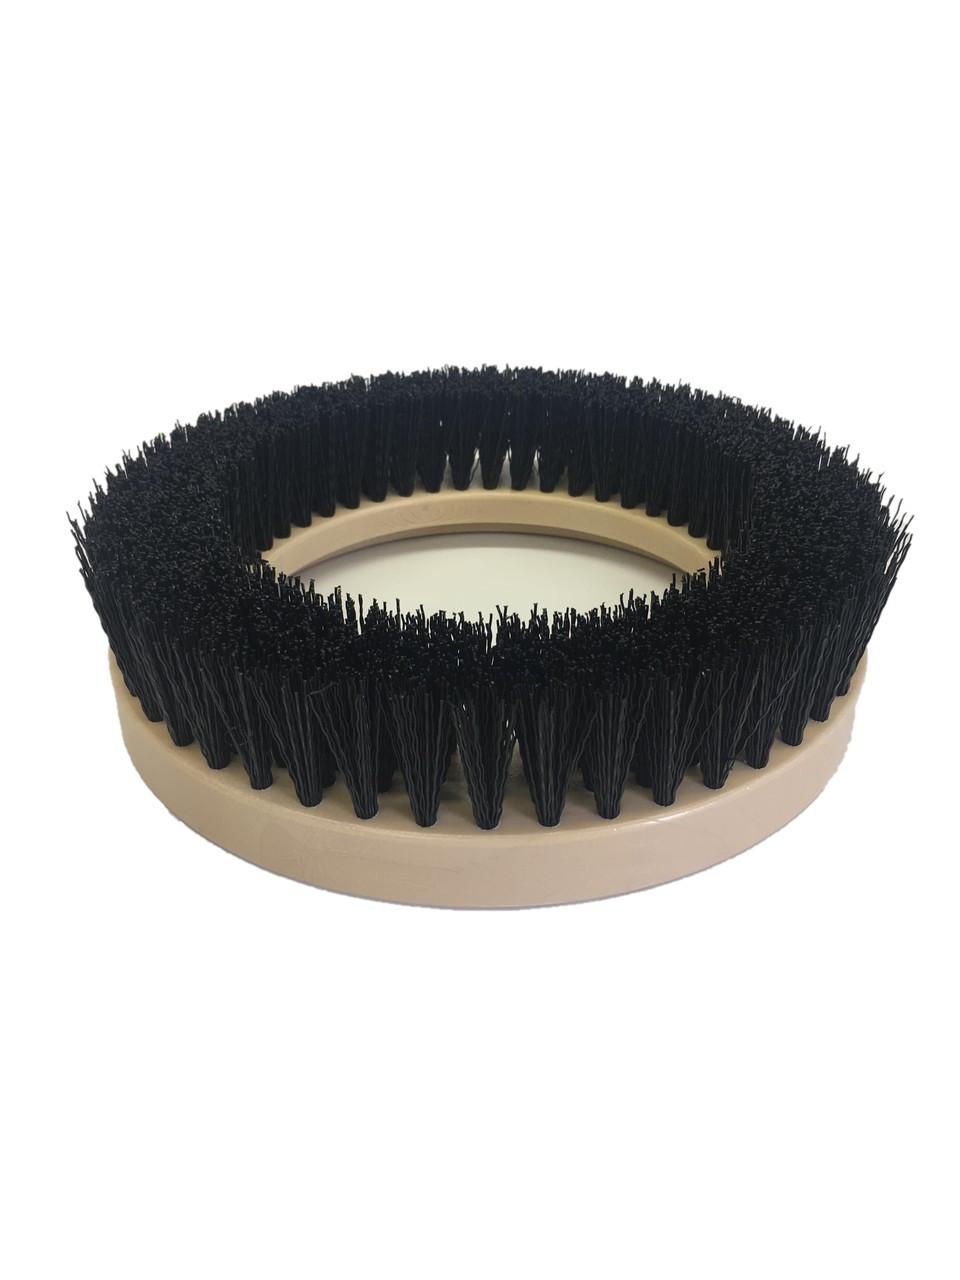 "9"" Flat Coarse Brush, 1.5"" bristle, PolyPro, #3 brush alone"